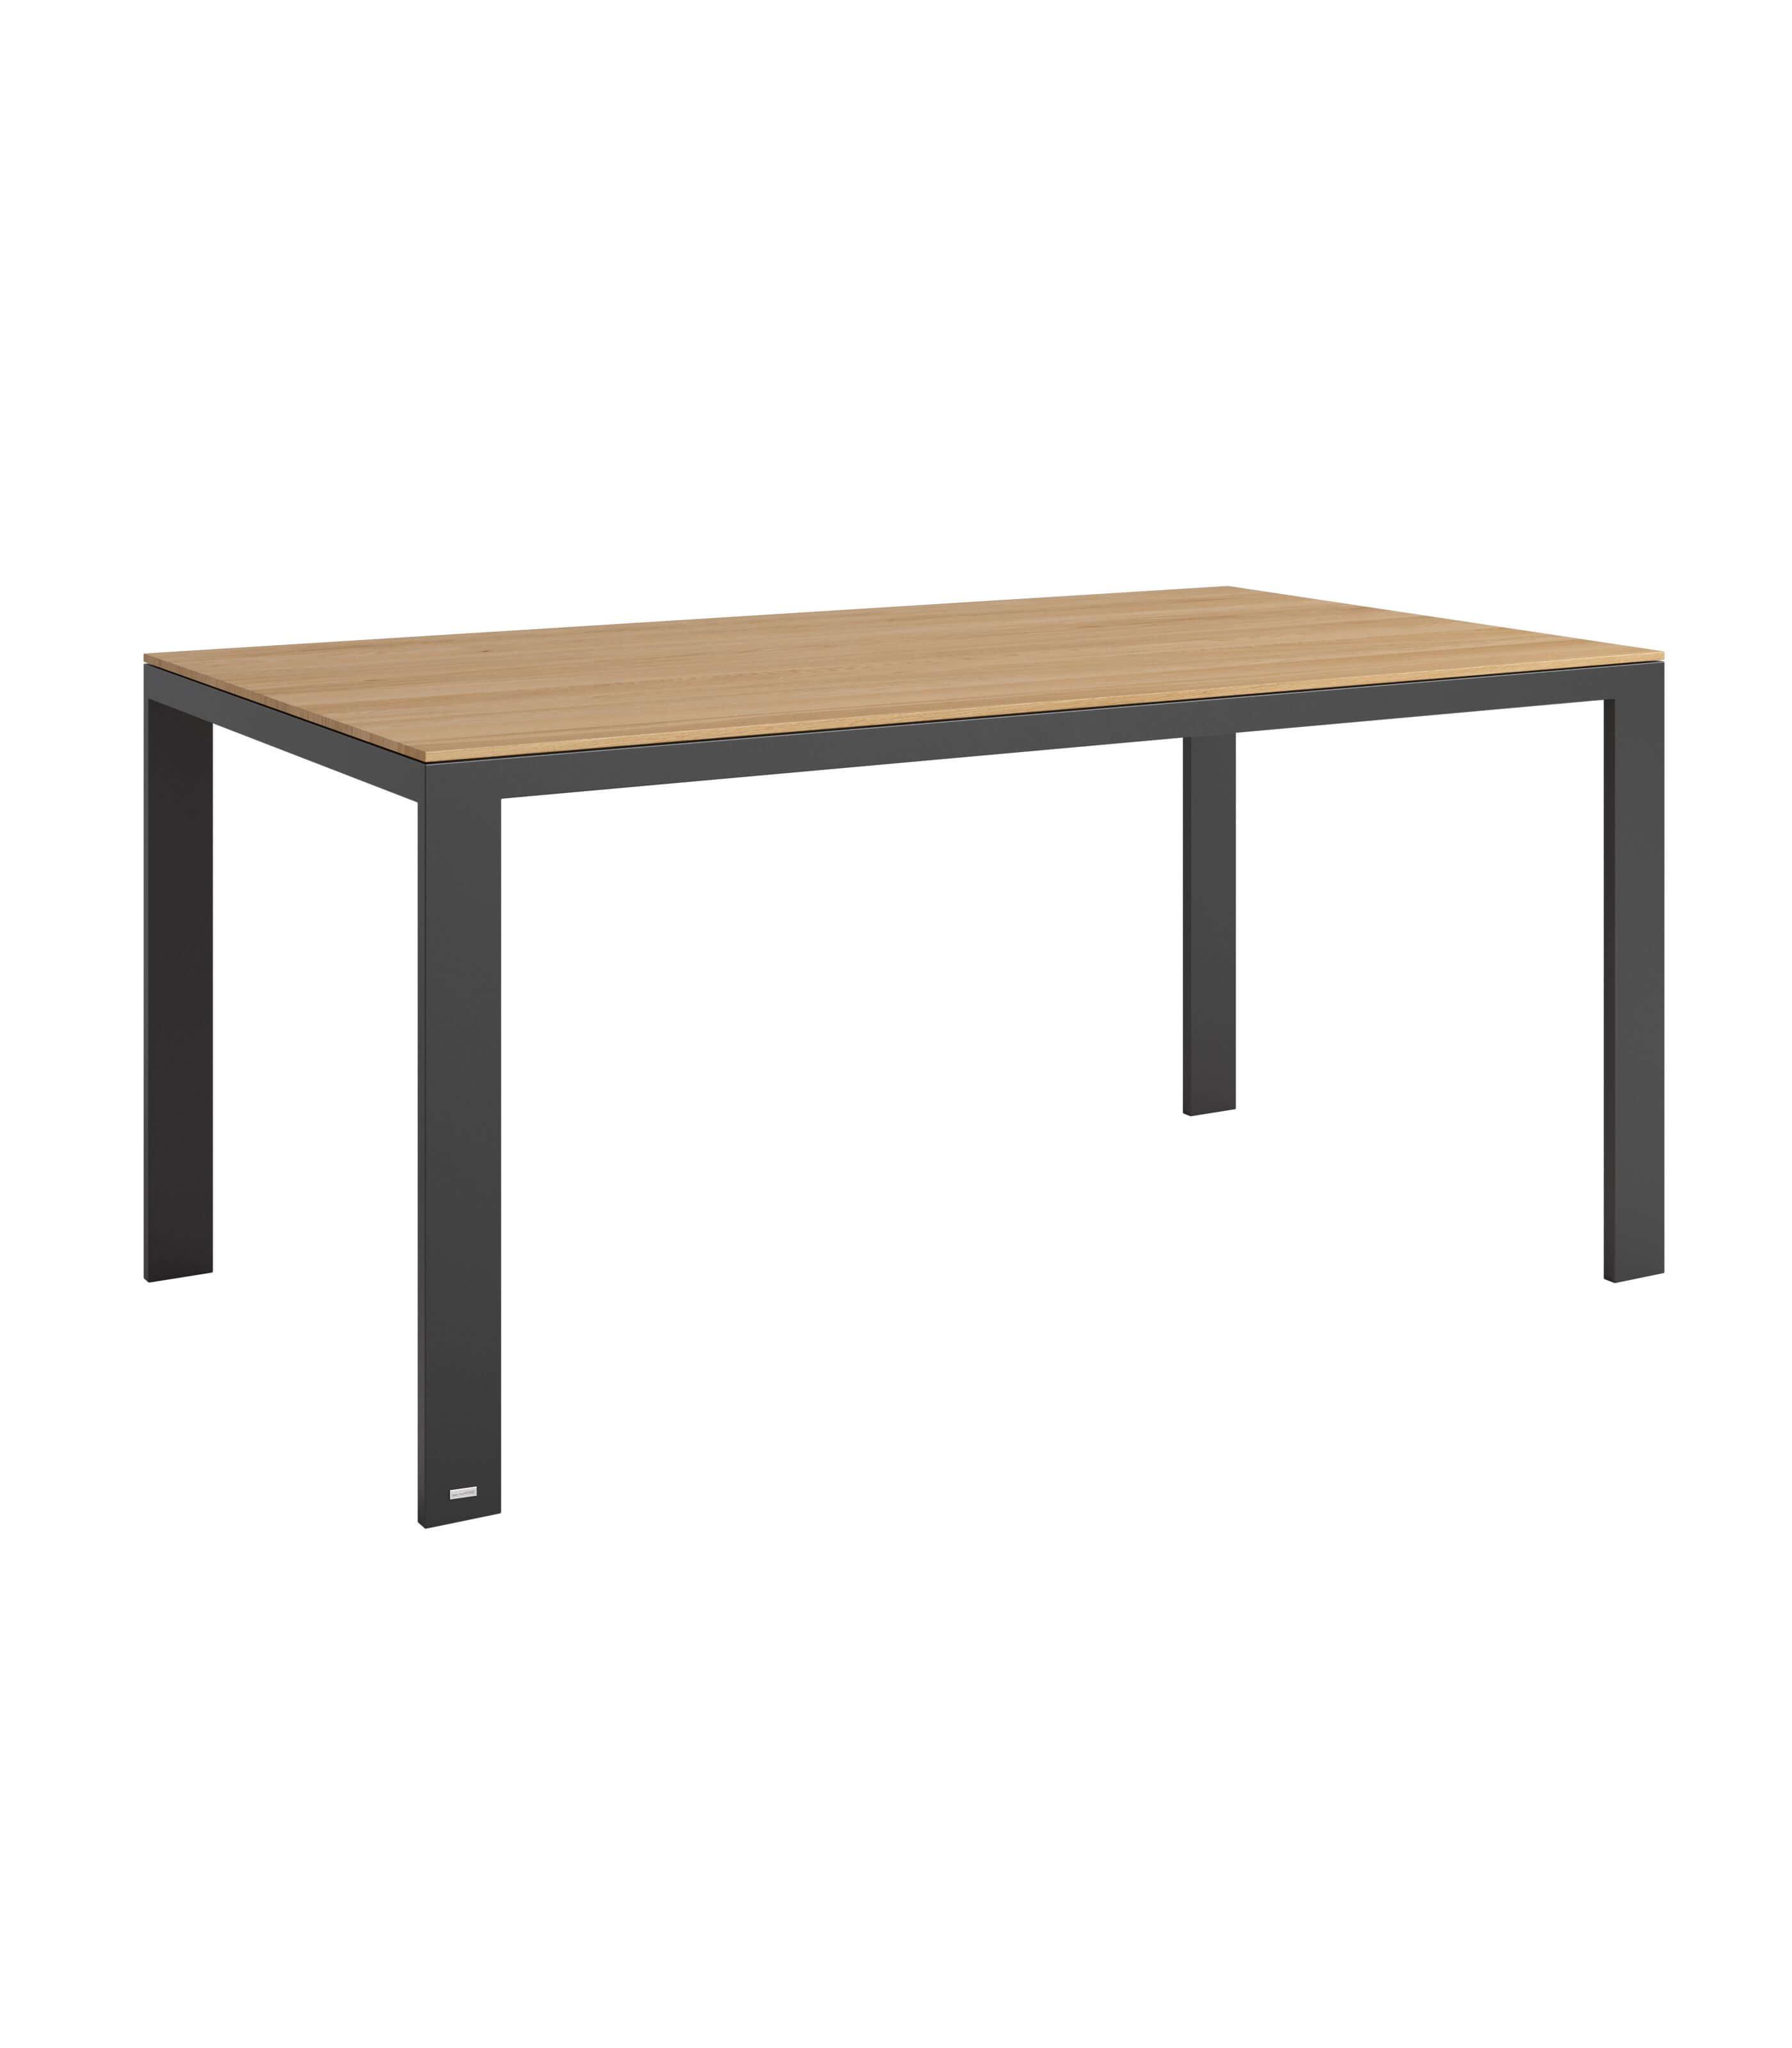 Delgado nowoczesny stół - take me HOME.